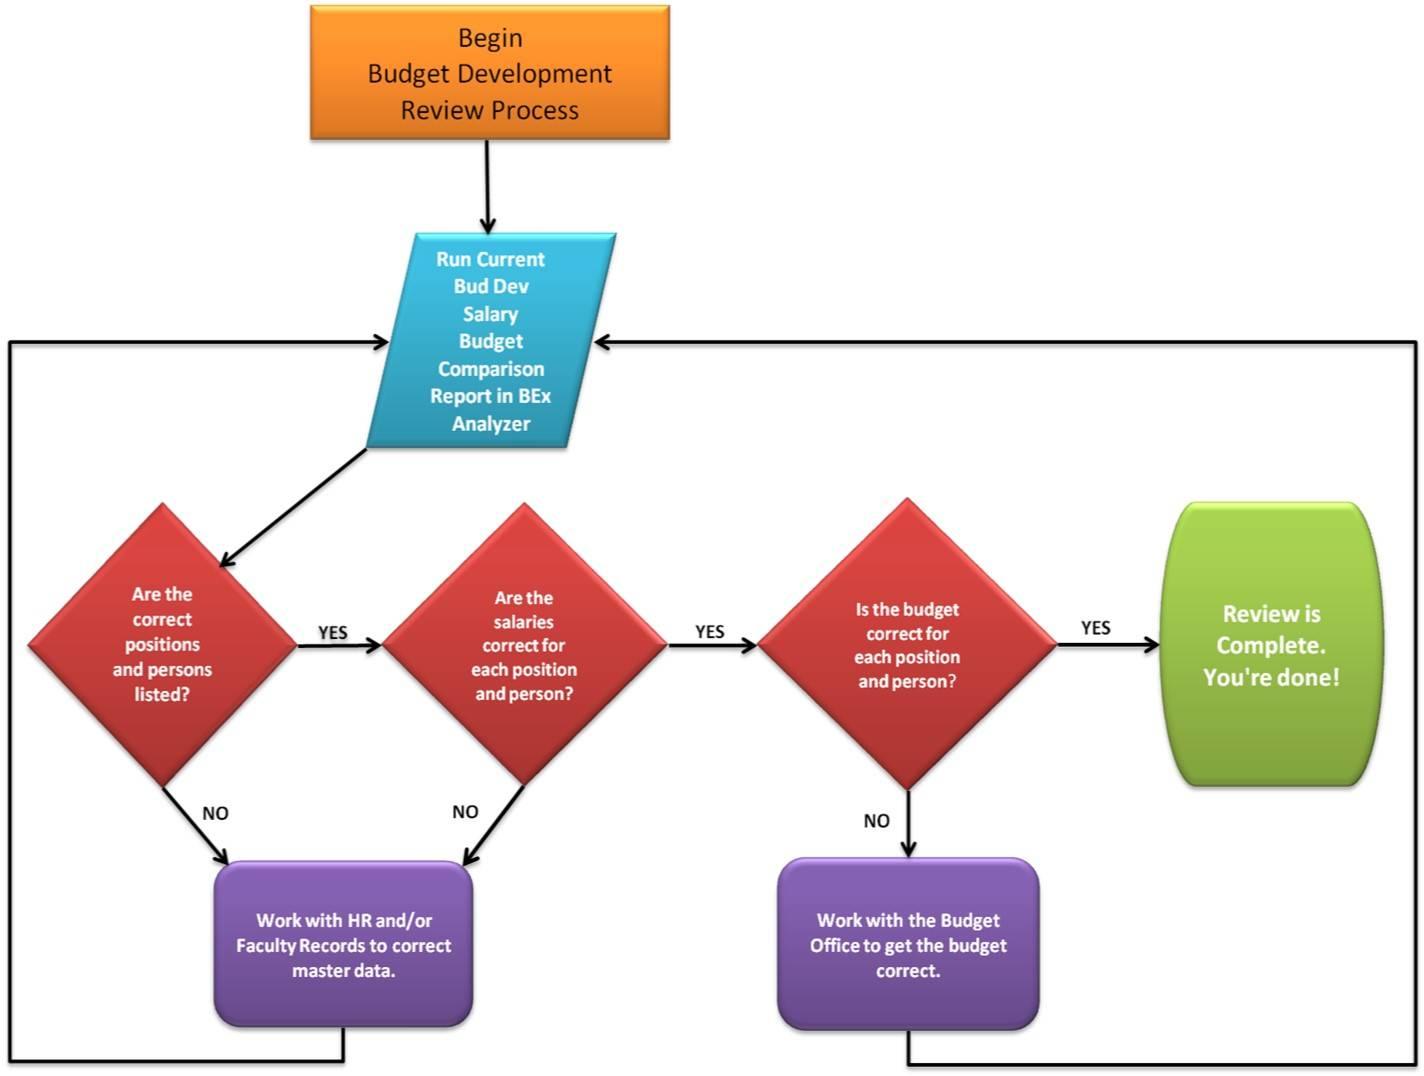 Hot Tub Wiring Diagram Likewise Hot Tub Control Panel Wiring Diagram